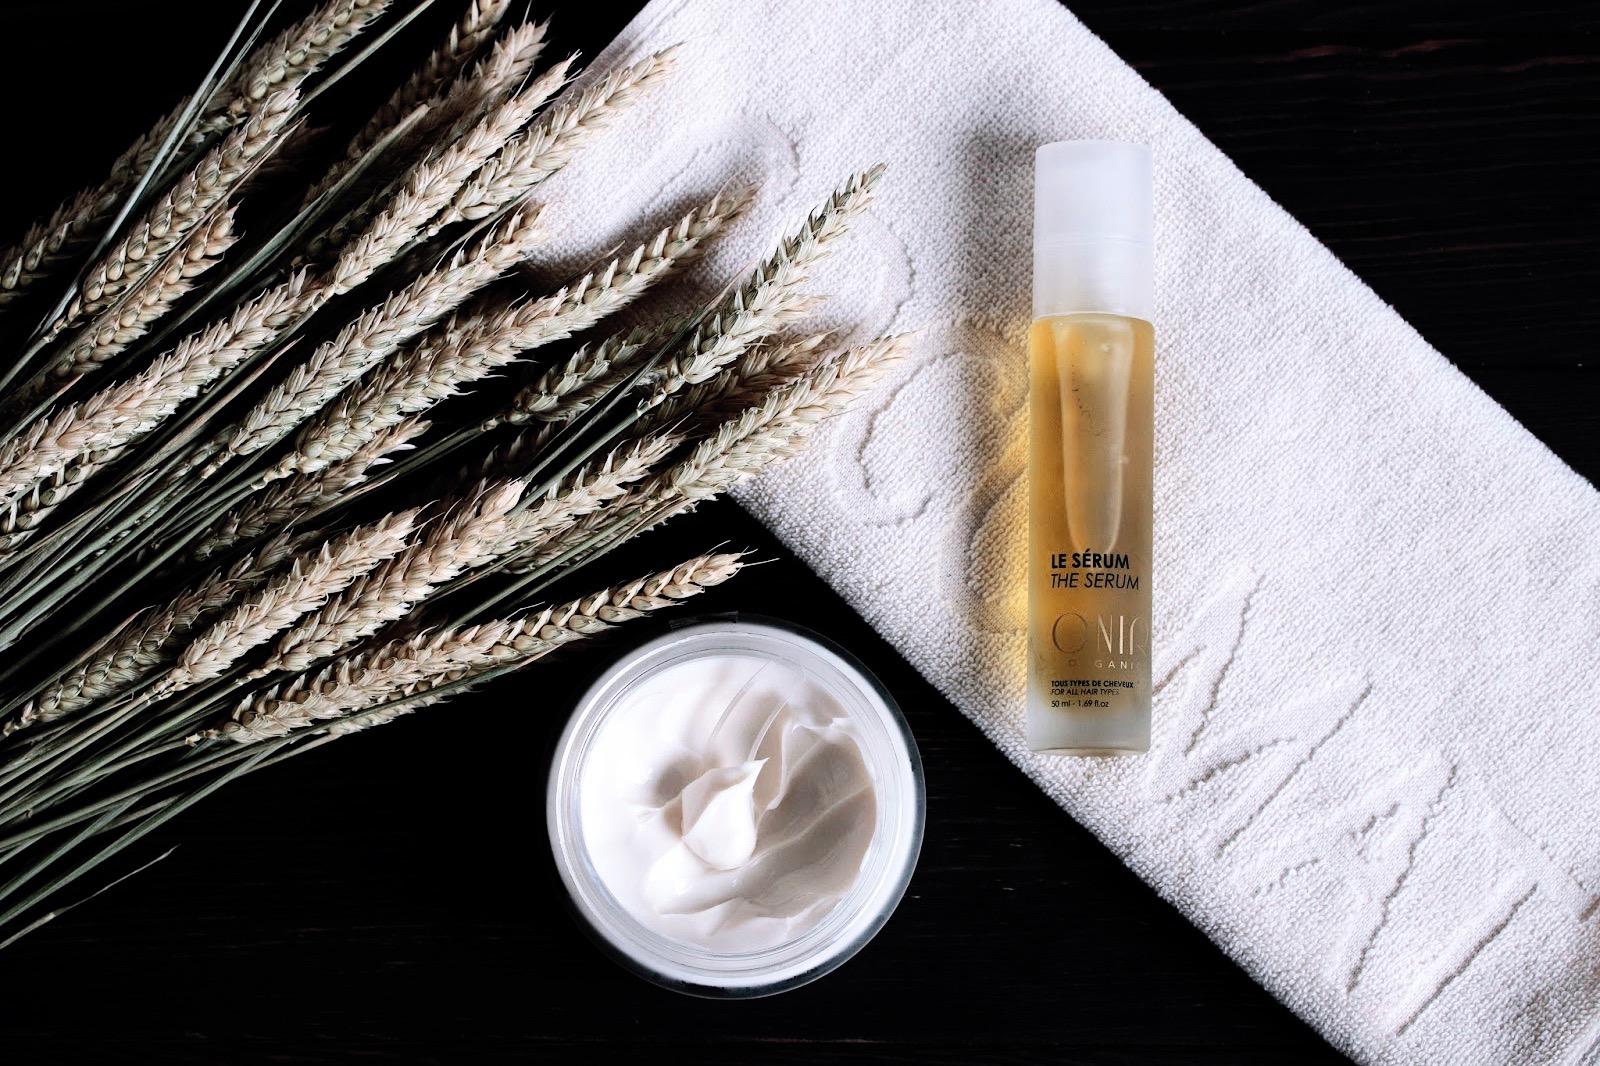 onira soins cheveux bio masque le serum huile cheveux avis test